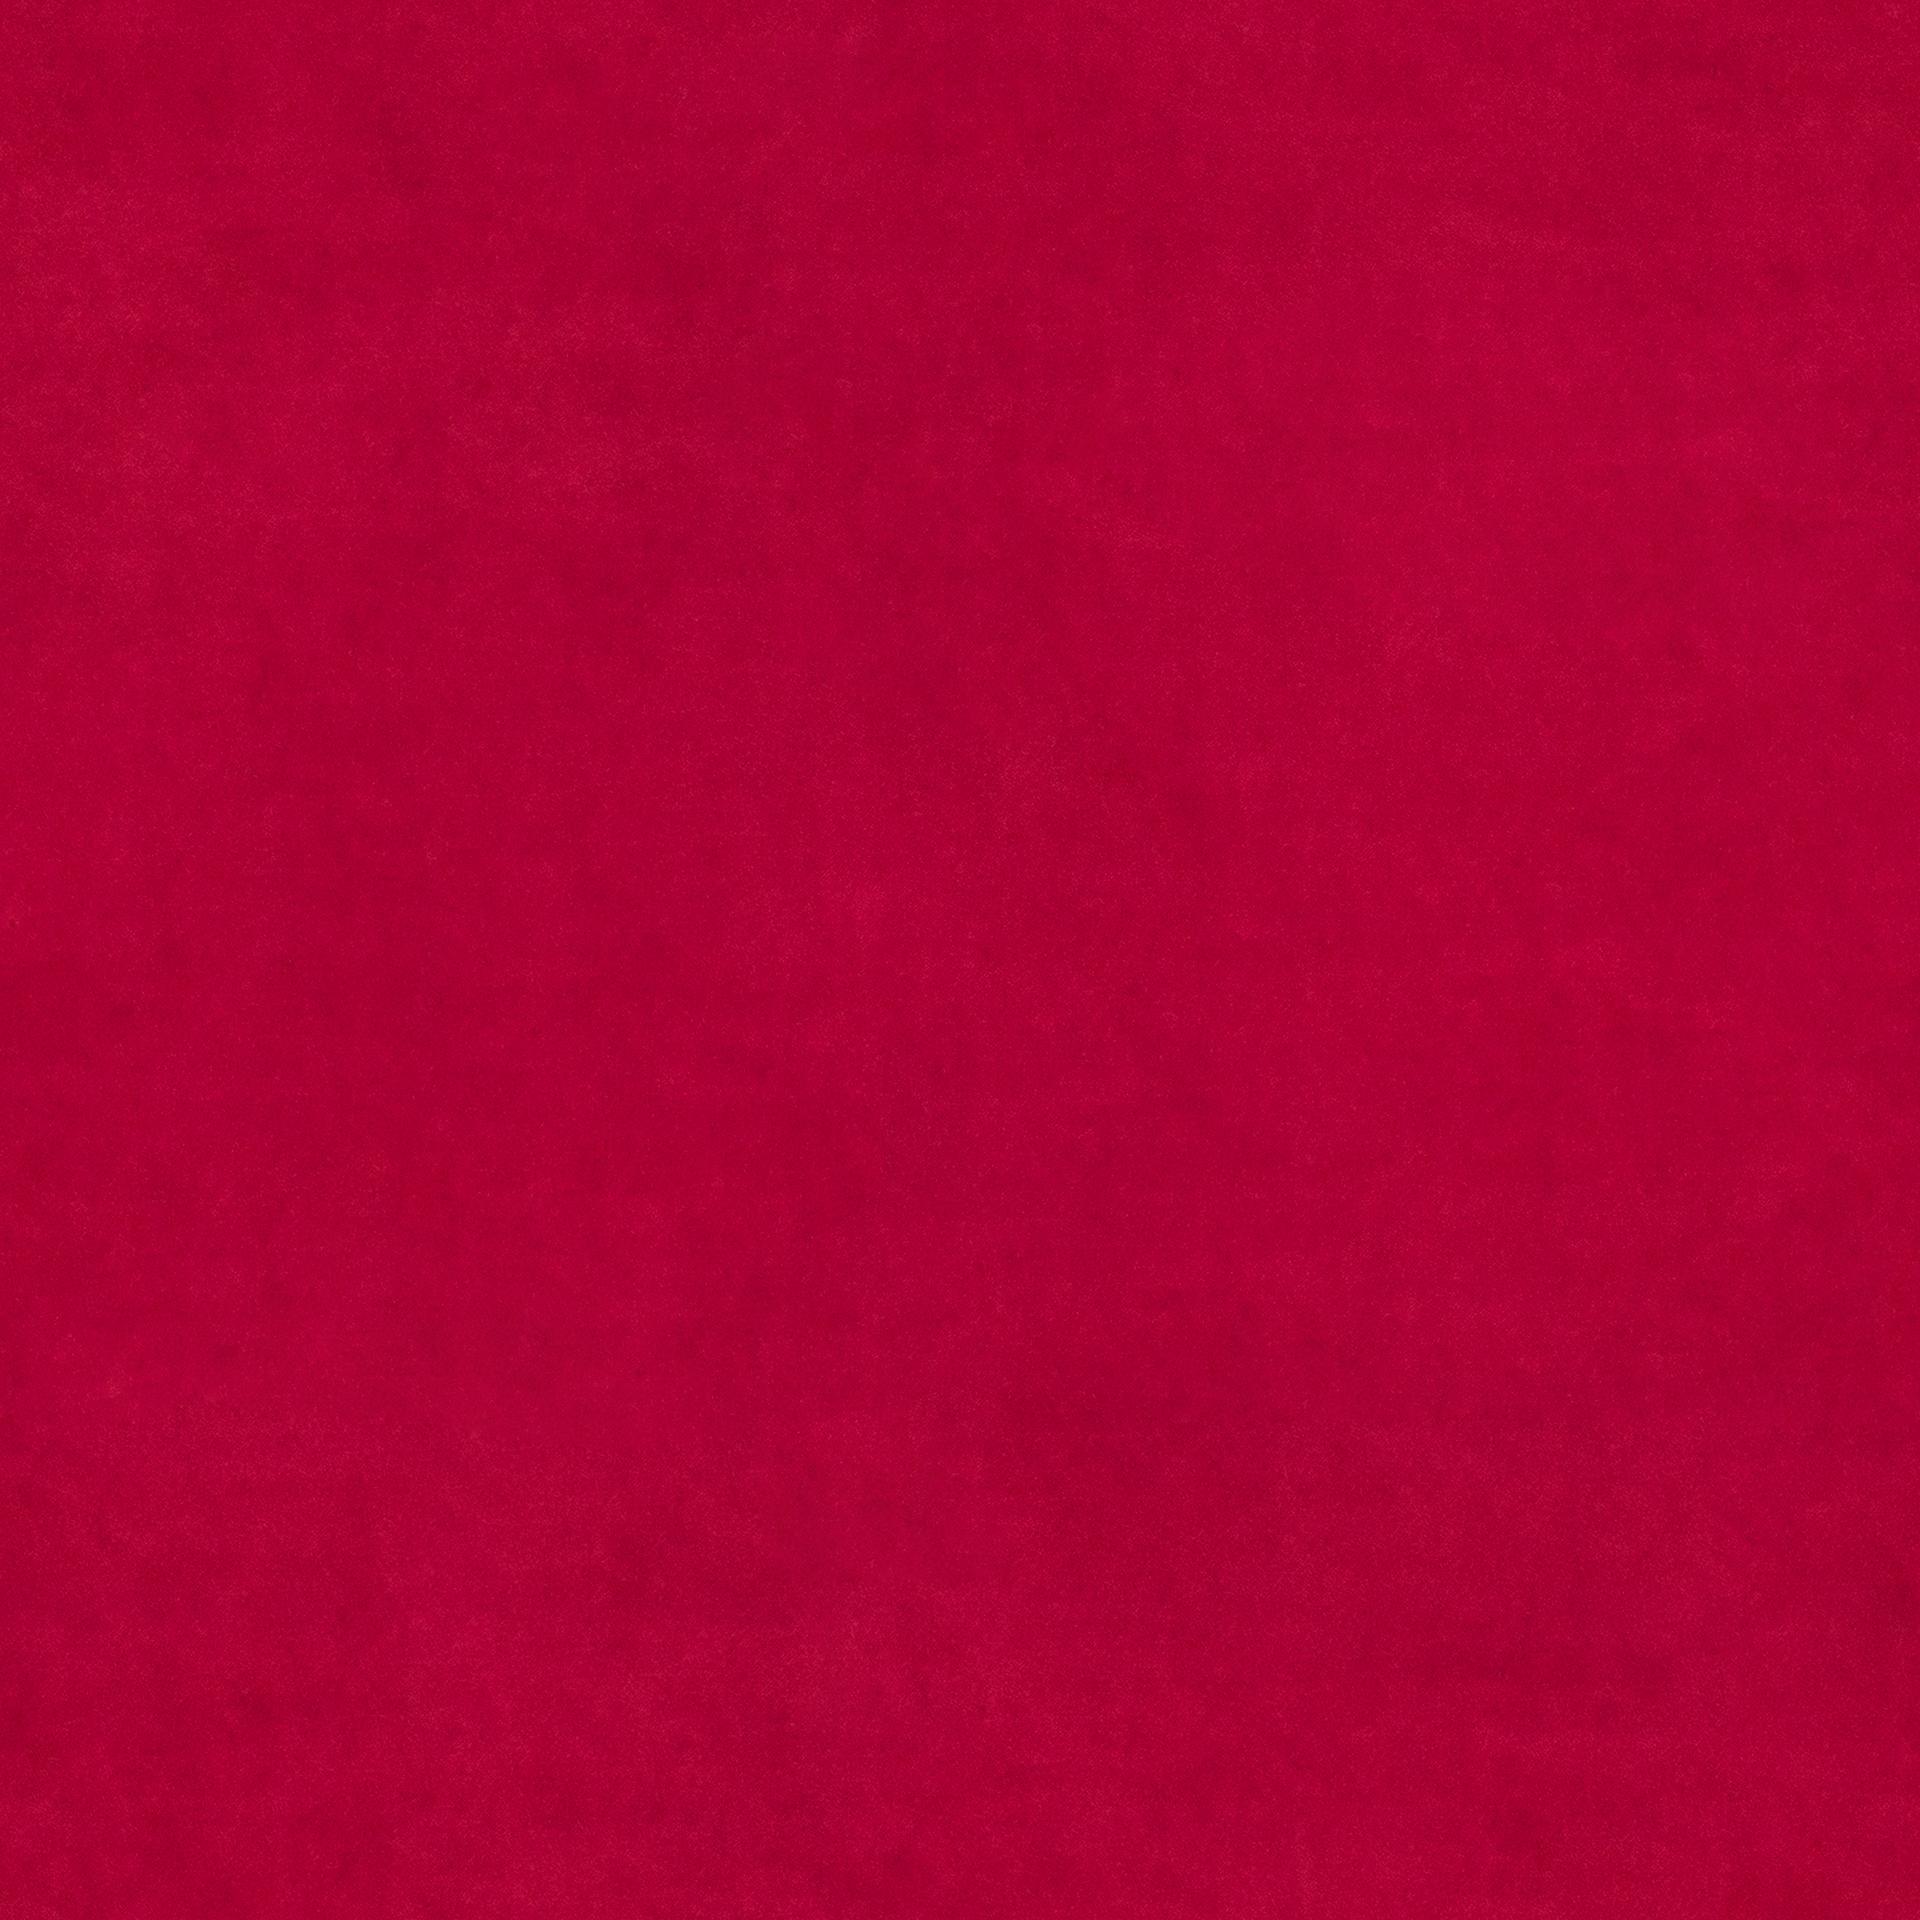 rubinrot BELTE43 (QUICK CLEAN)